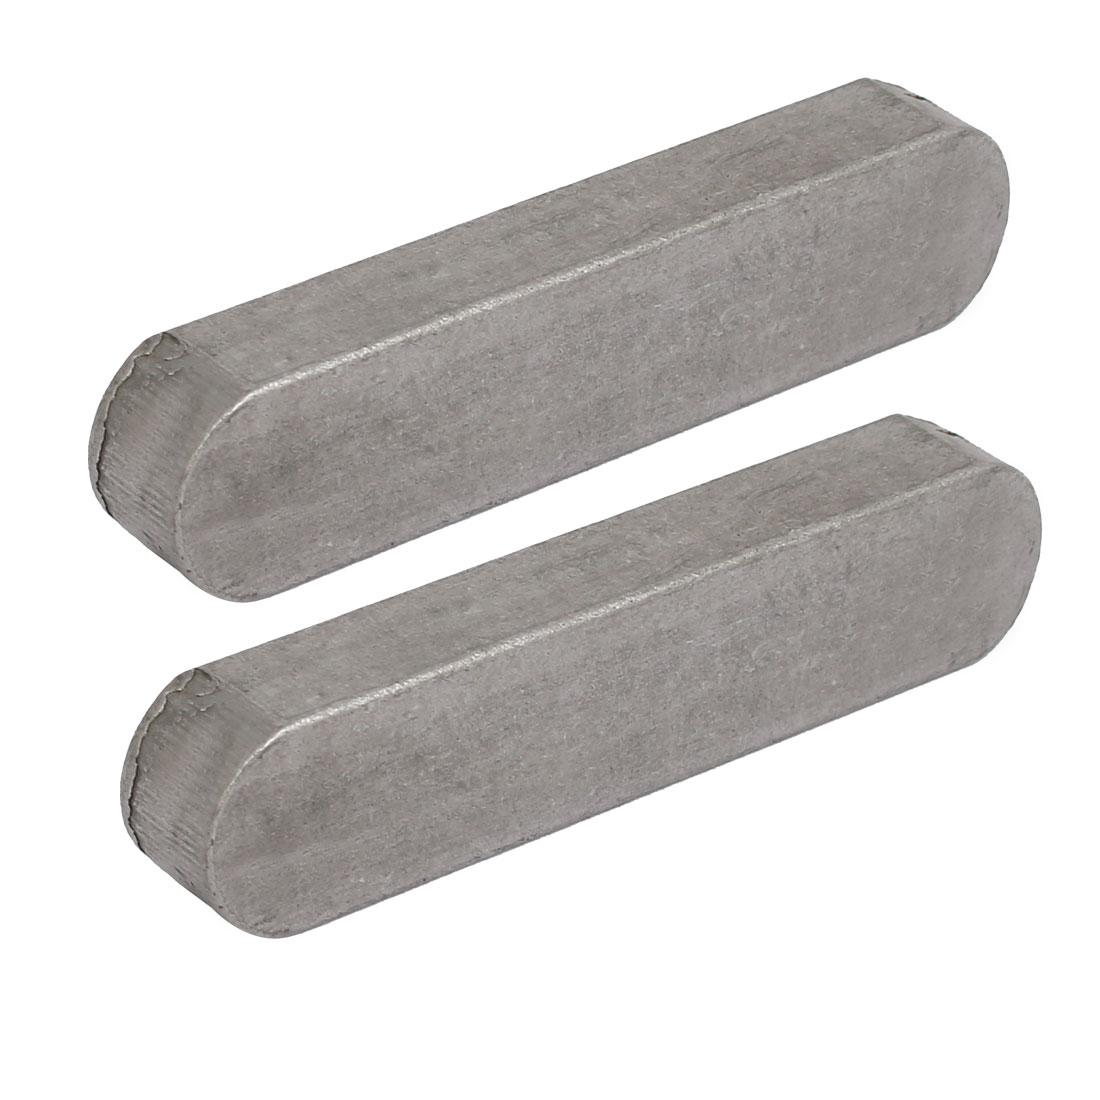 70mmx16mmx10mm Carbon Steel Key Stock To Lock Pulleys 2pcs